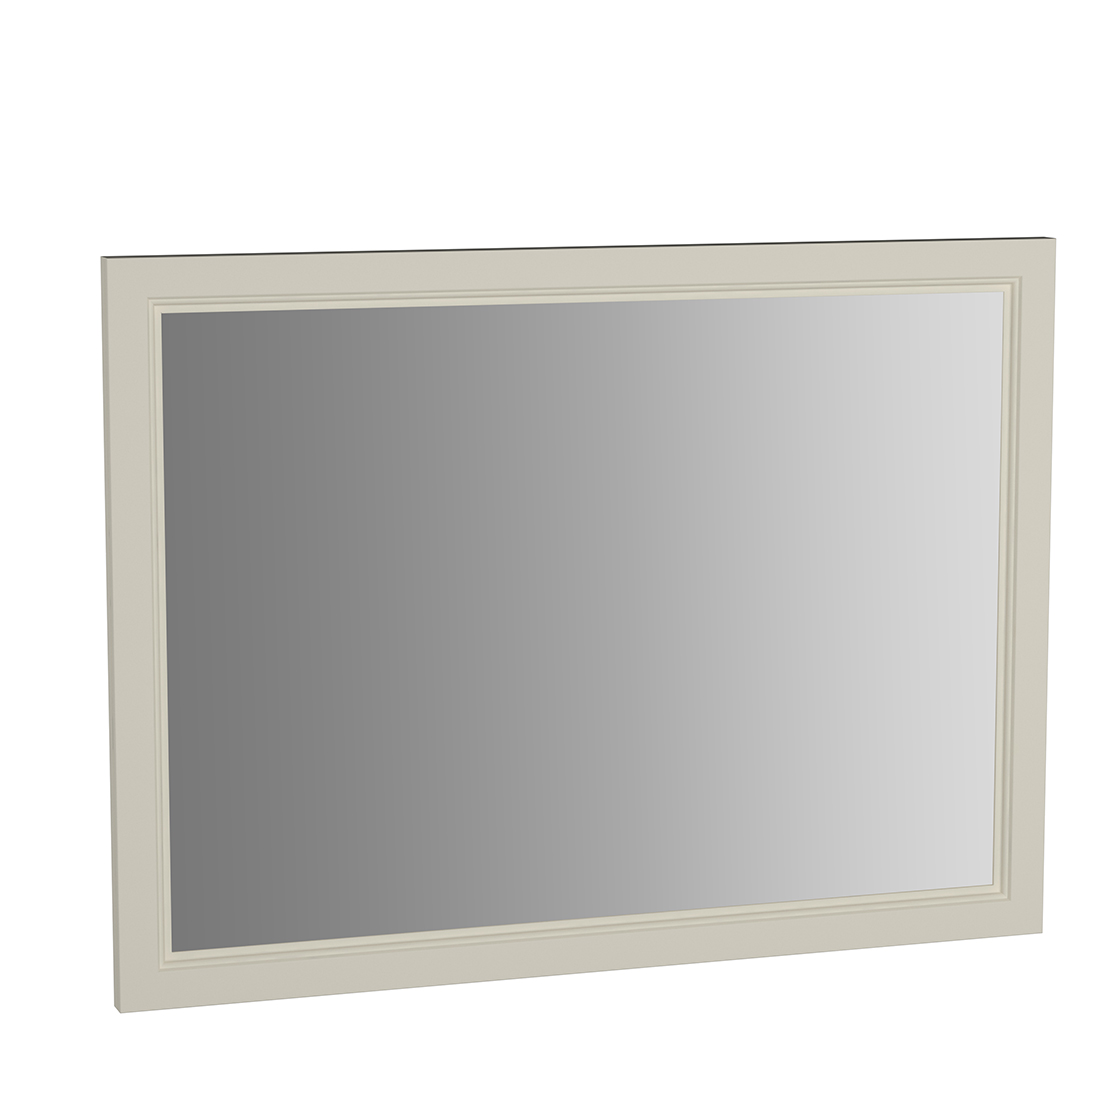 Valarte miroir, 100 cm, ivoire mat